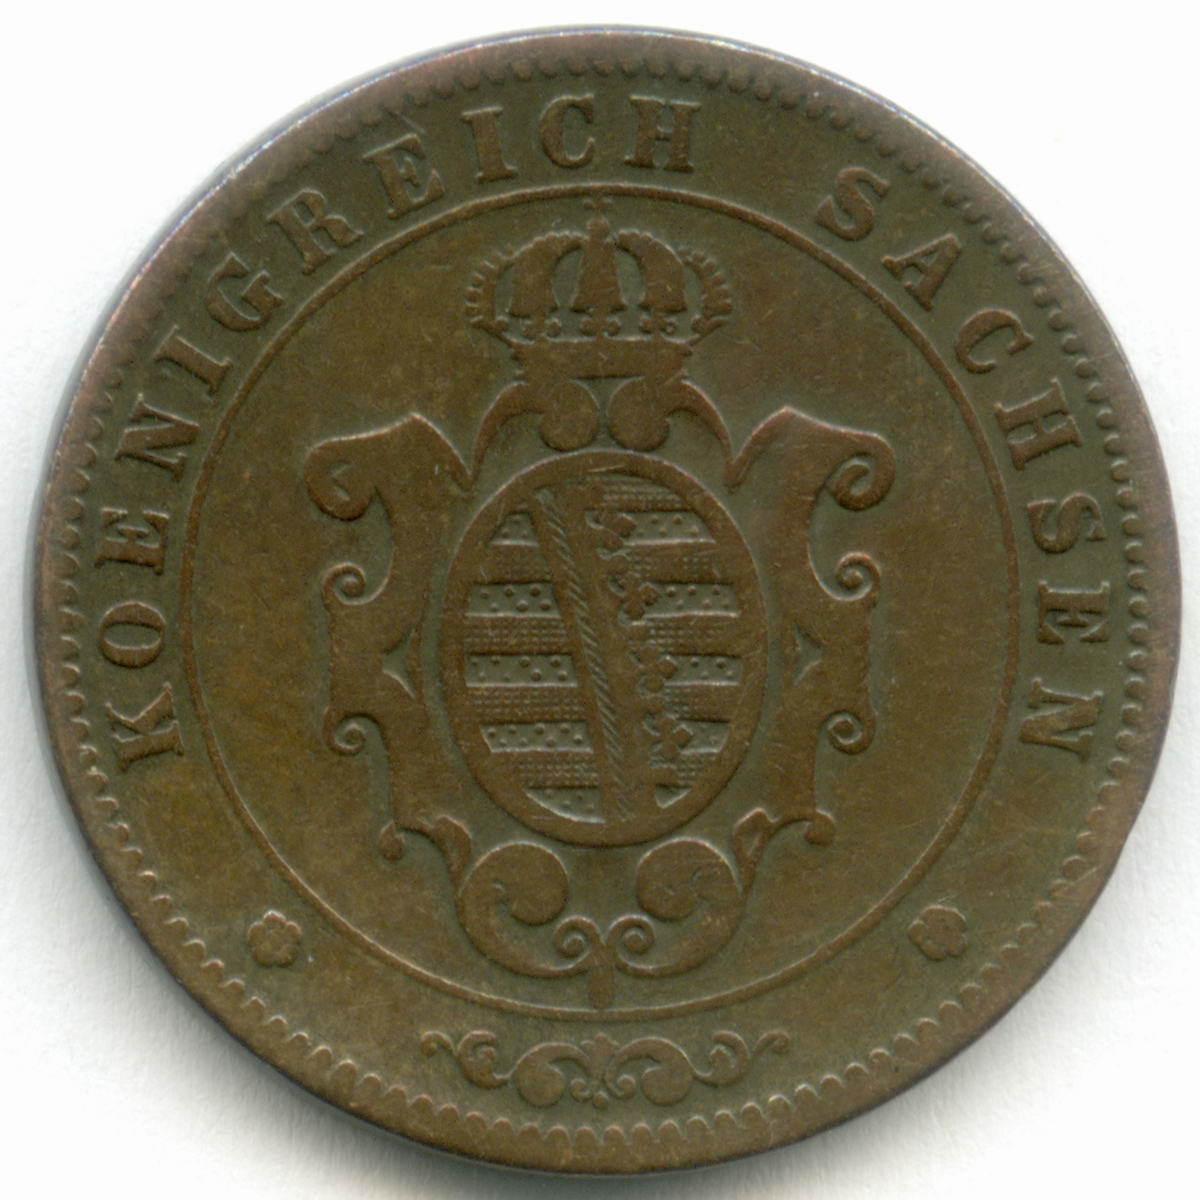 5 пфеннигов 1863 (B). Германия-Саксония. Медь VF